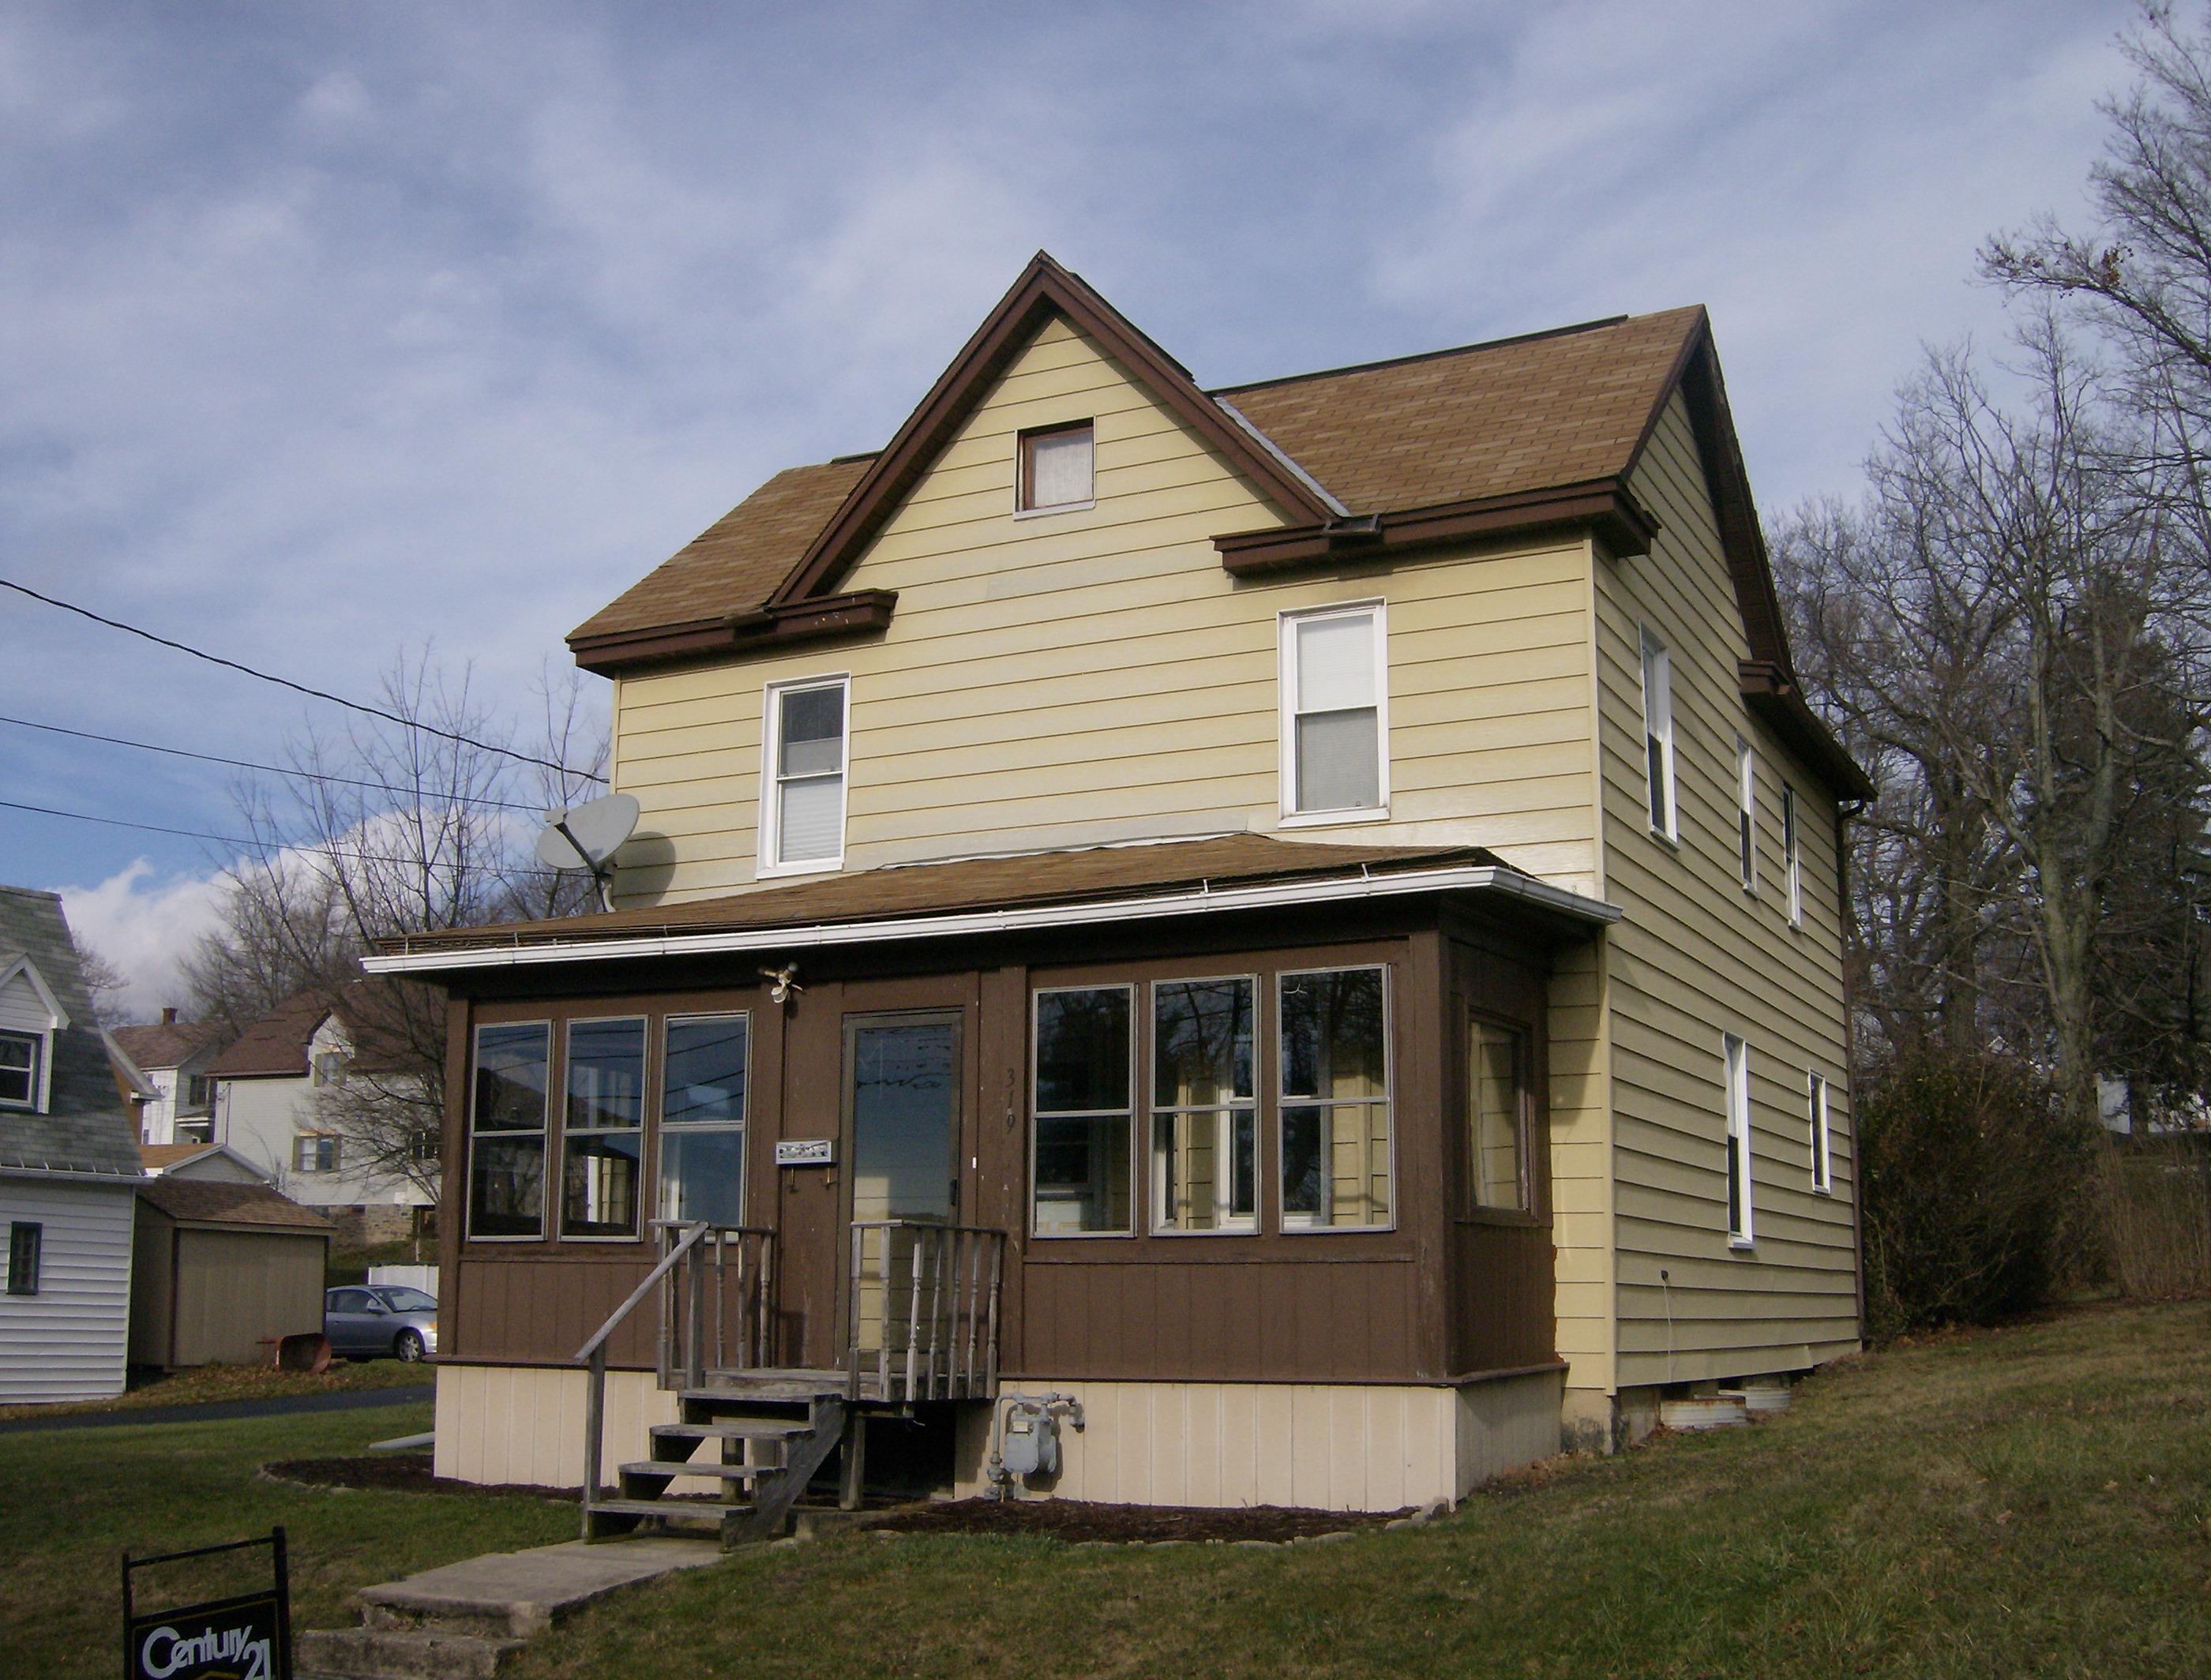 319 Powell Ave, Cresson, Pennsylvania 16630